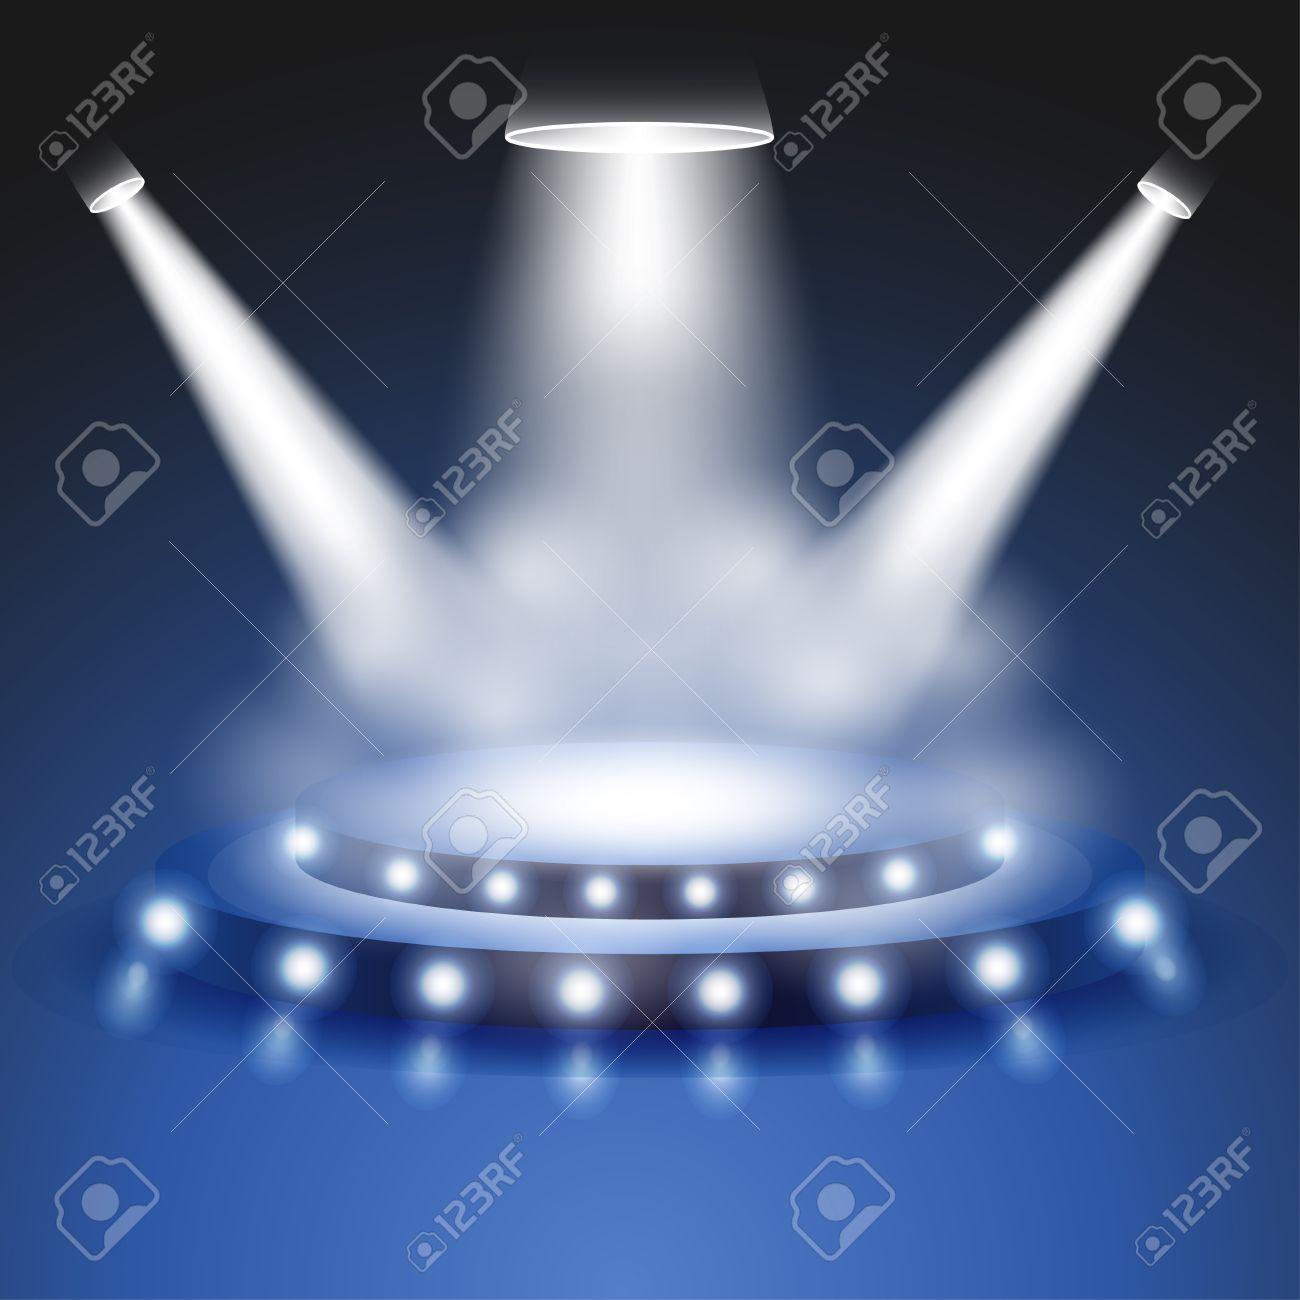 Scene with realistic Light and smoke effect, Stage or podium spotlight, Show scene spotlight, shine spotlight on transparent background, stage lighting spotlights, scene illumination, vector - 55946792